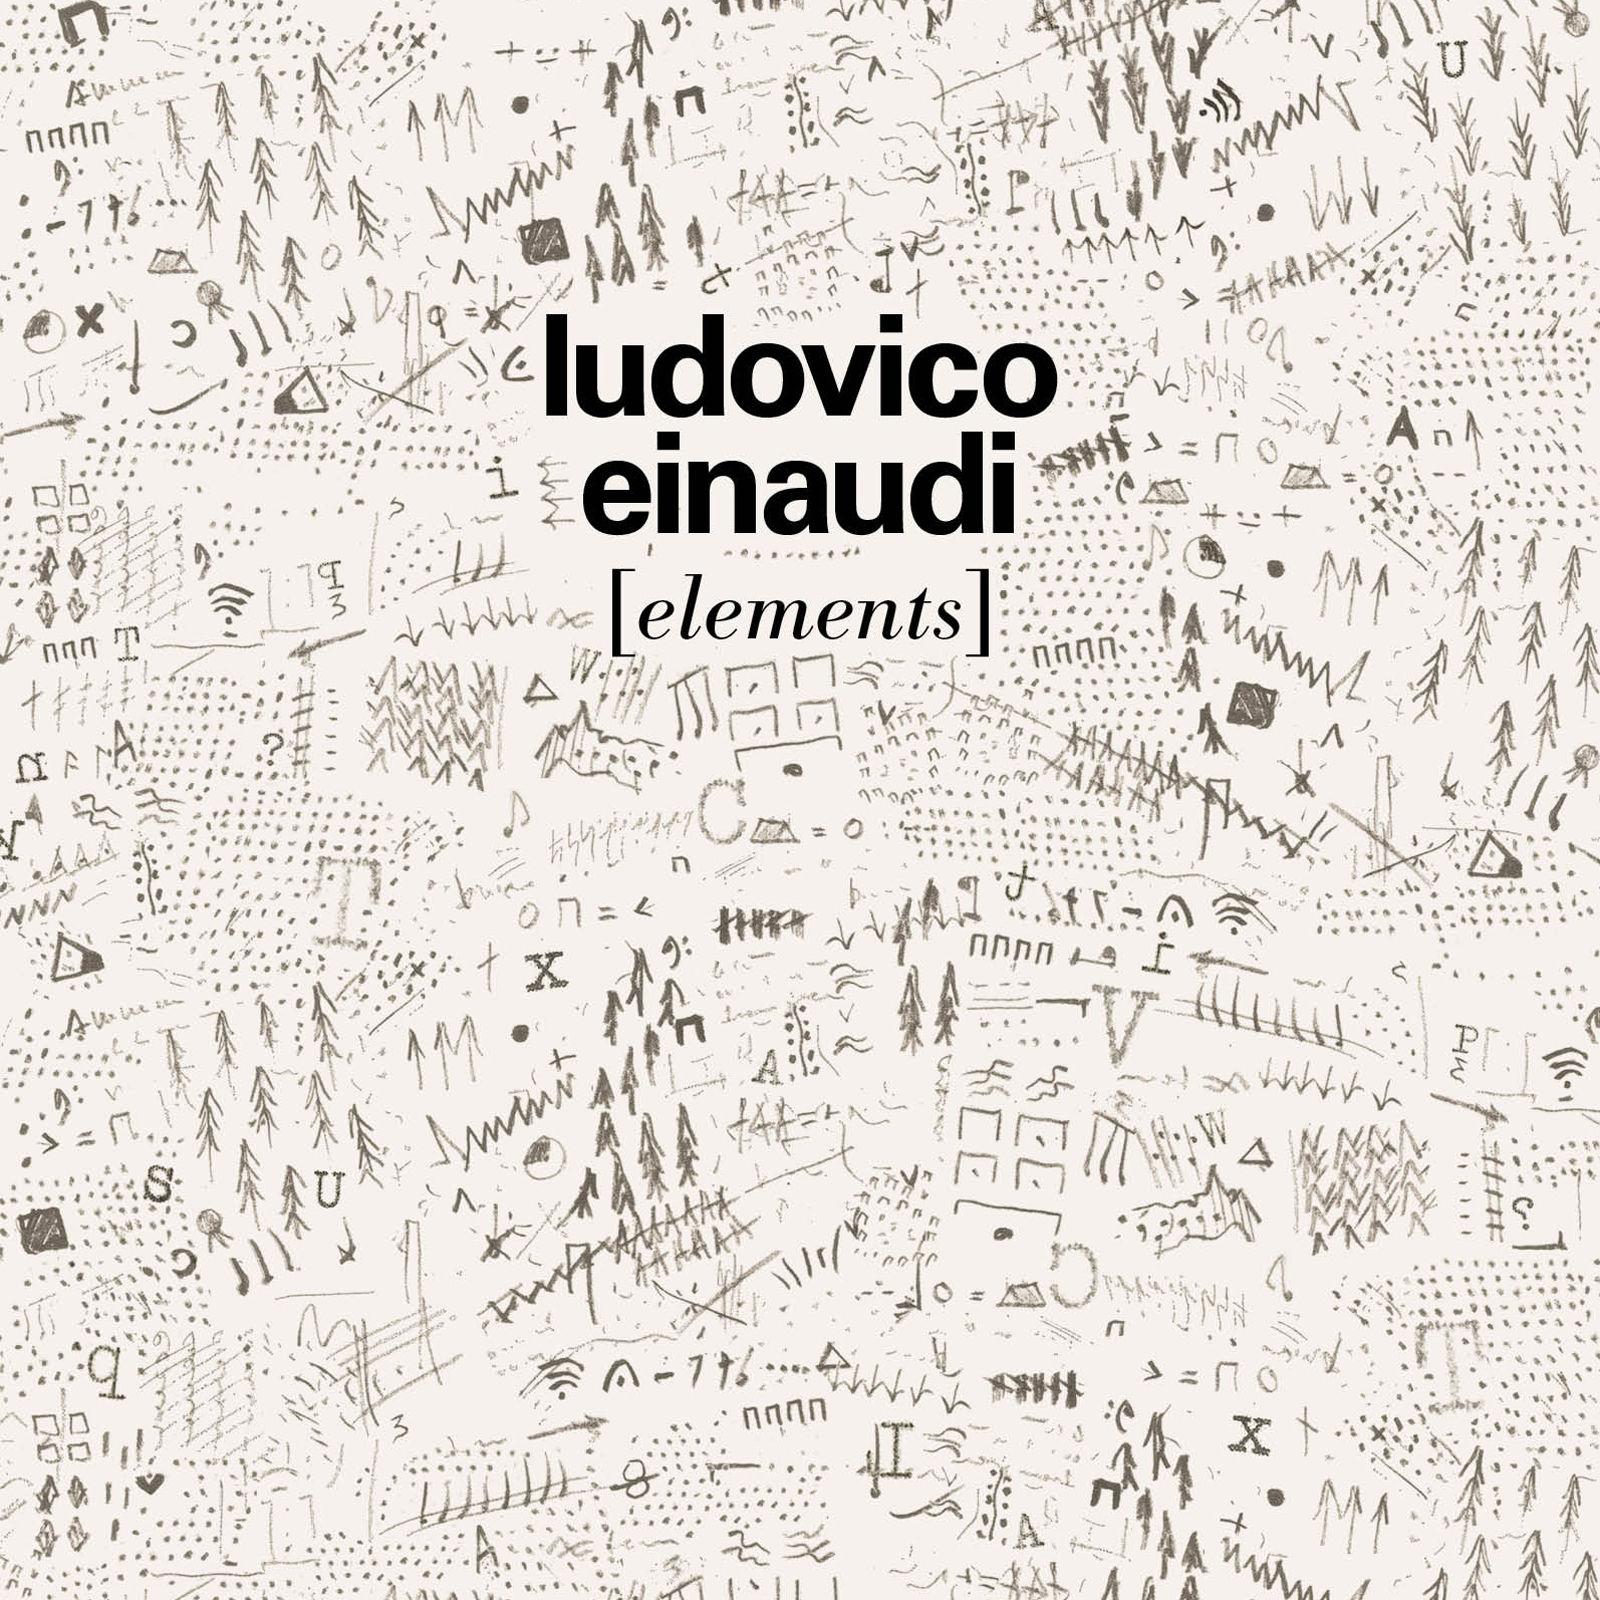 Ludovico Einaudi Elements cover